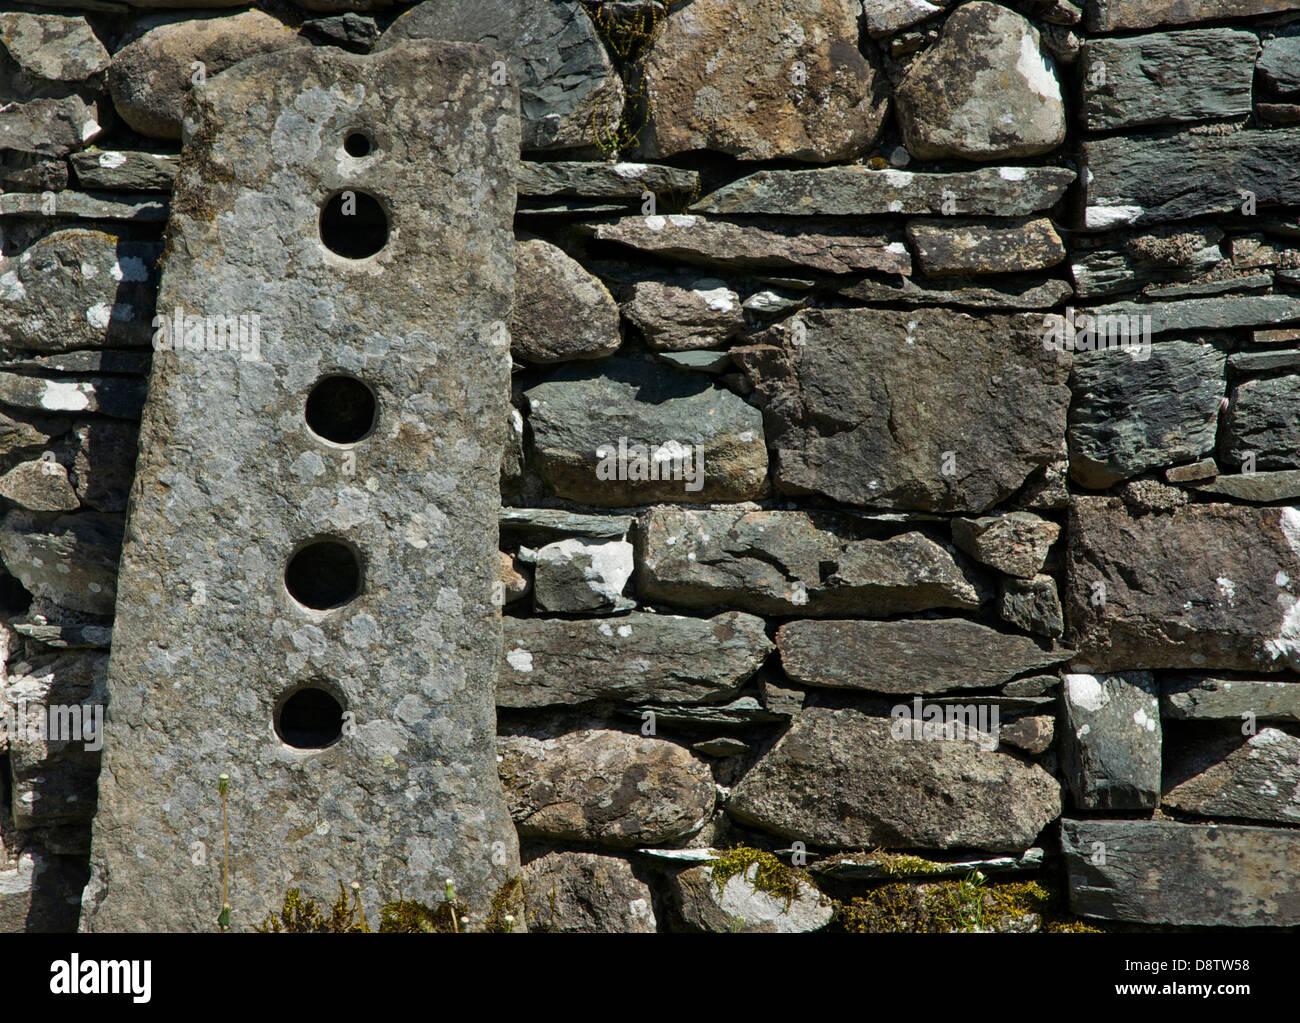 Old-fashioned gatepost and dry stone wall, South Lakeland, Cumbria, England UK - Stock Image